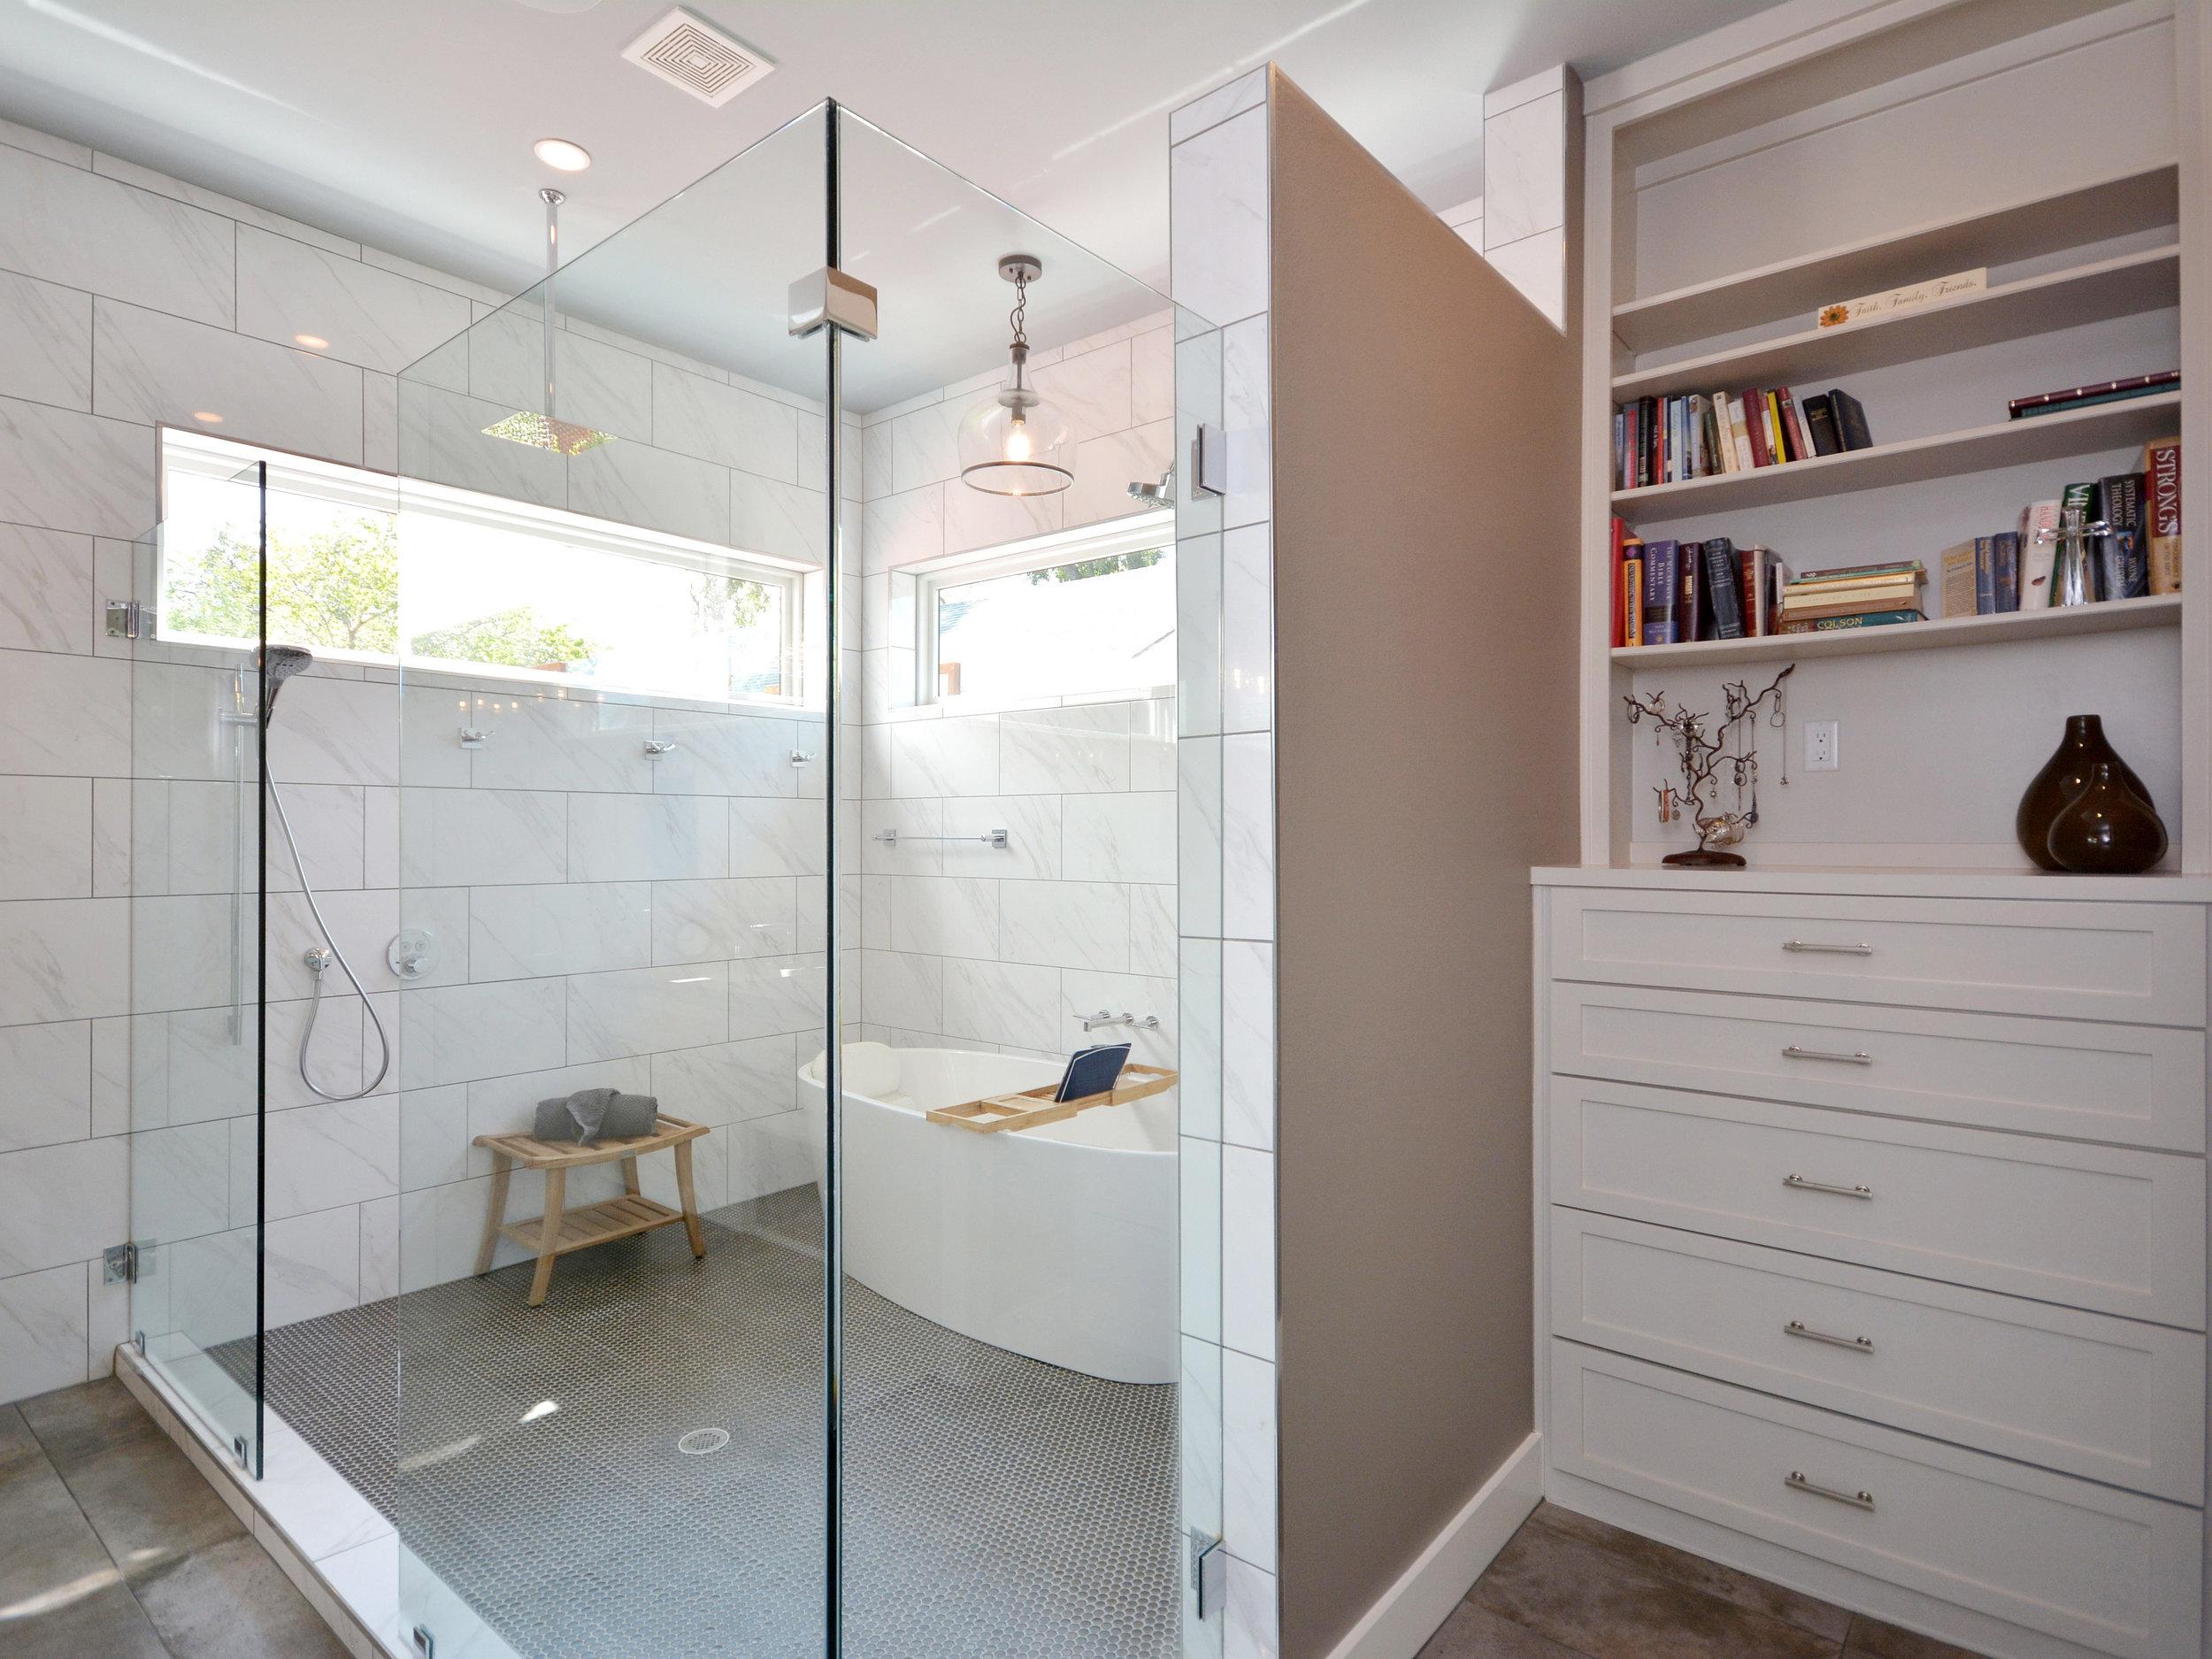 023_Master Bath Cabinetry.jpg